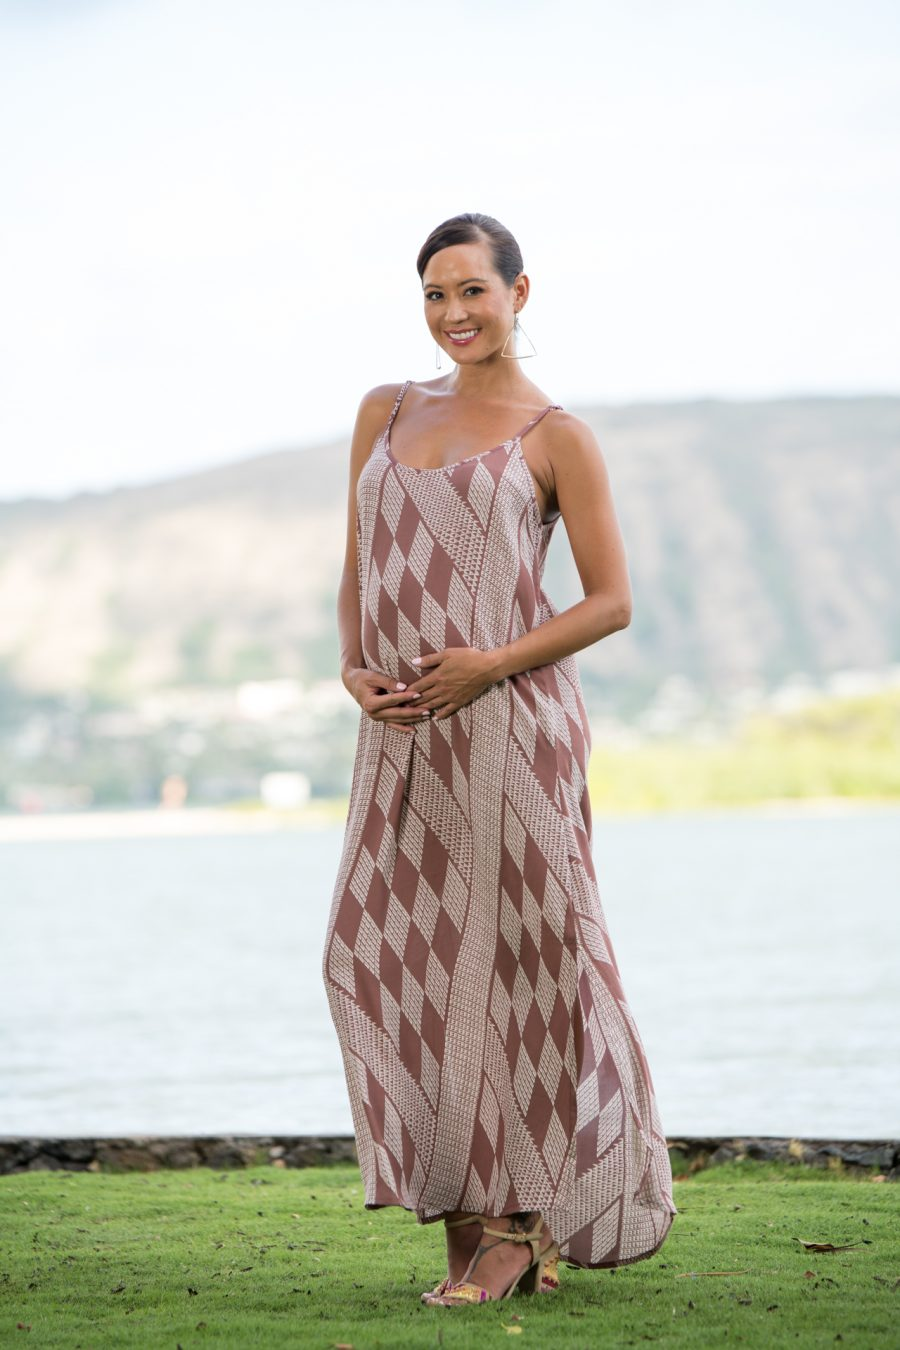 Model wearing Uluniu Maxi Dress in Fired Brick White Kamehameha Pattern - Front View